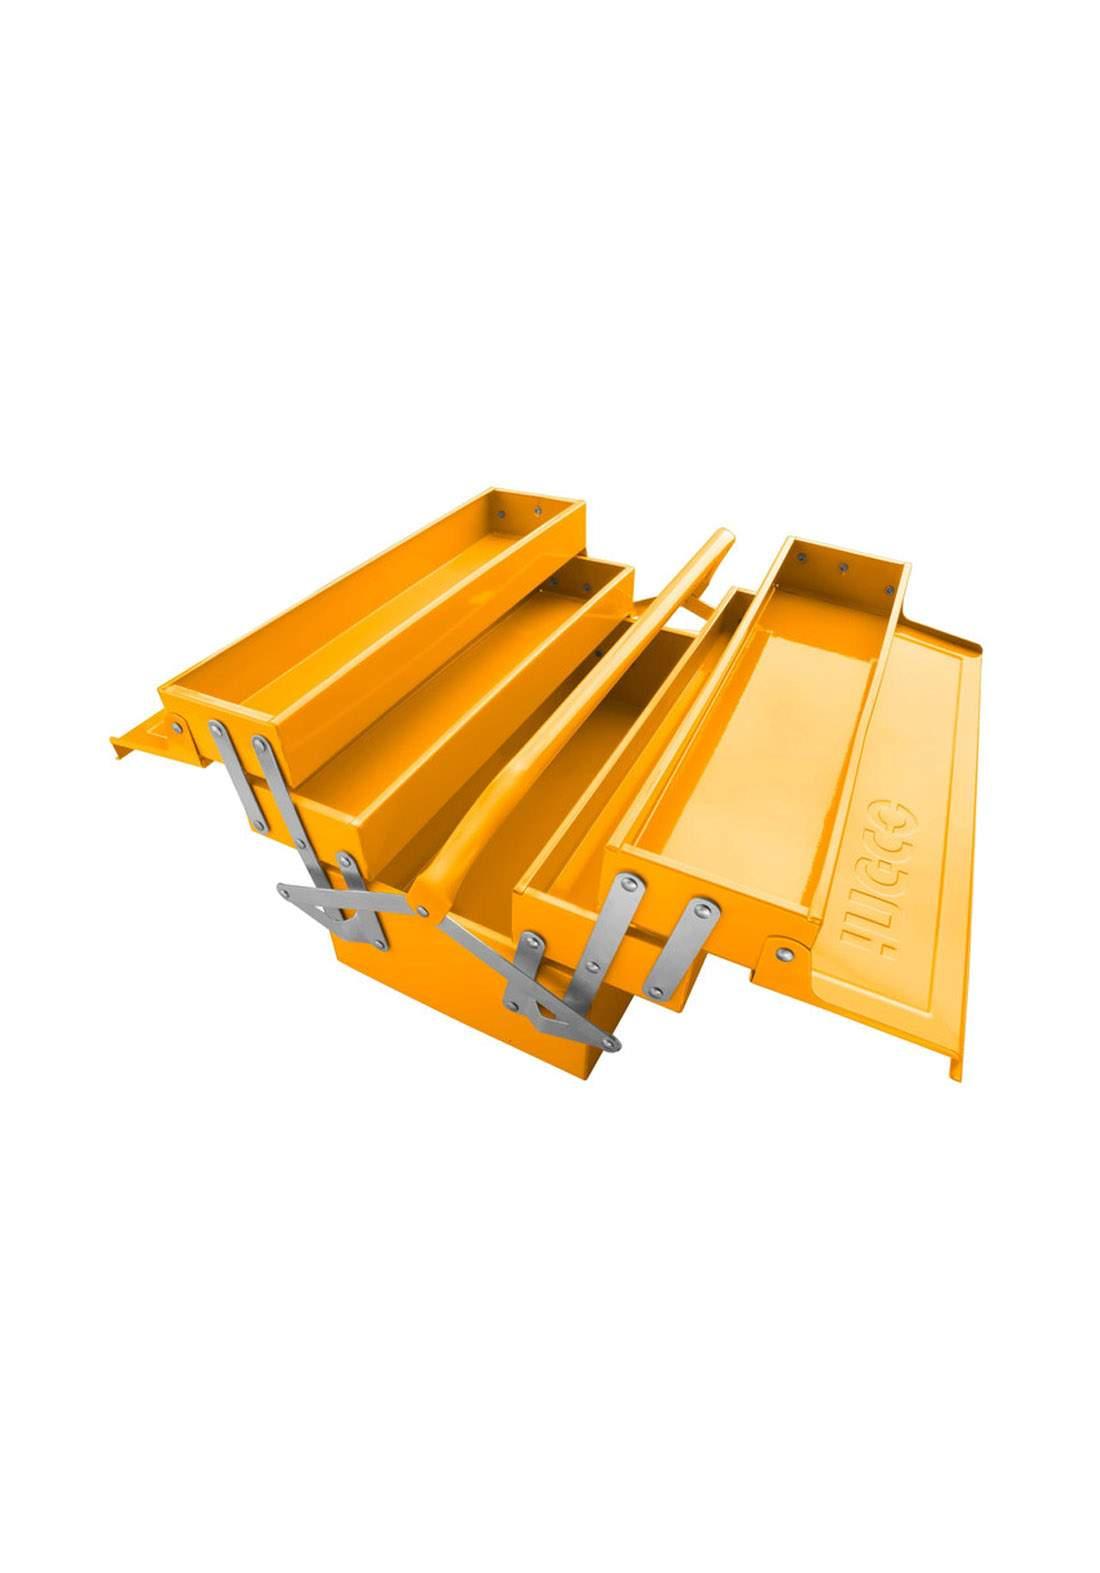 Ingco HTB03 Metal Tool Box Yallow  صندوق حفظ وتنظيم العُدد